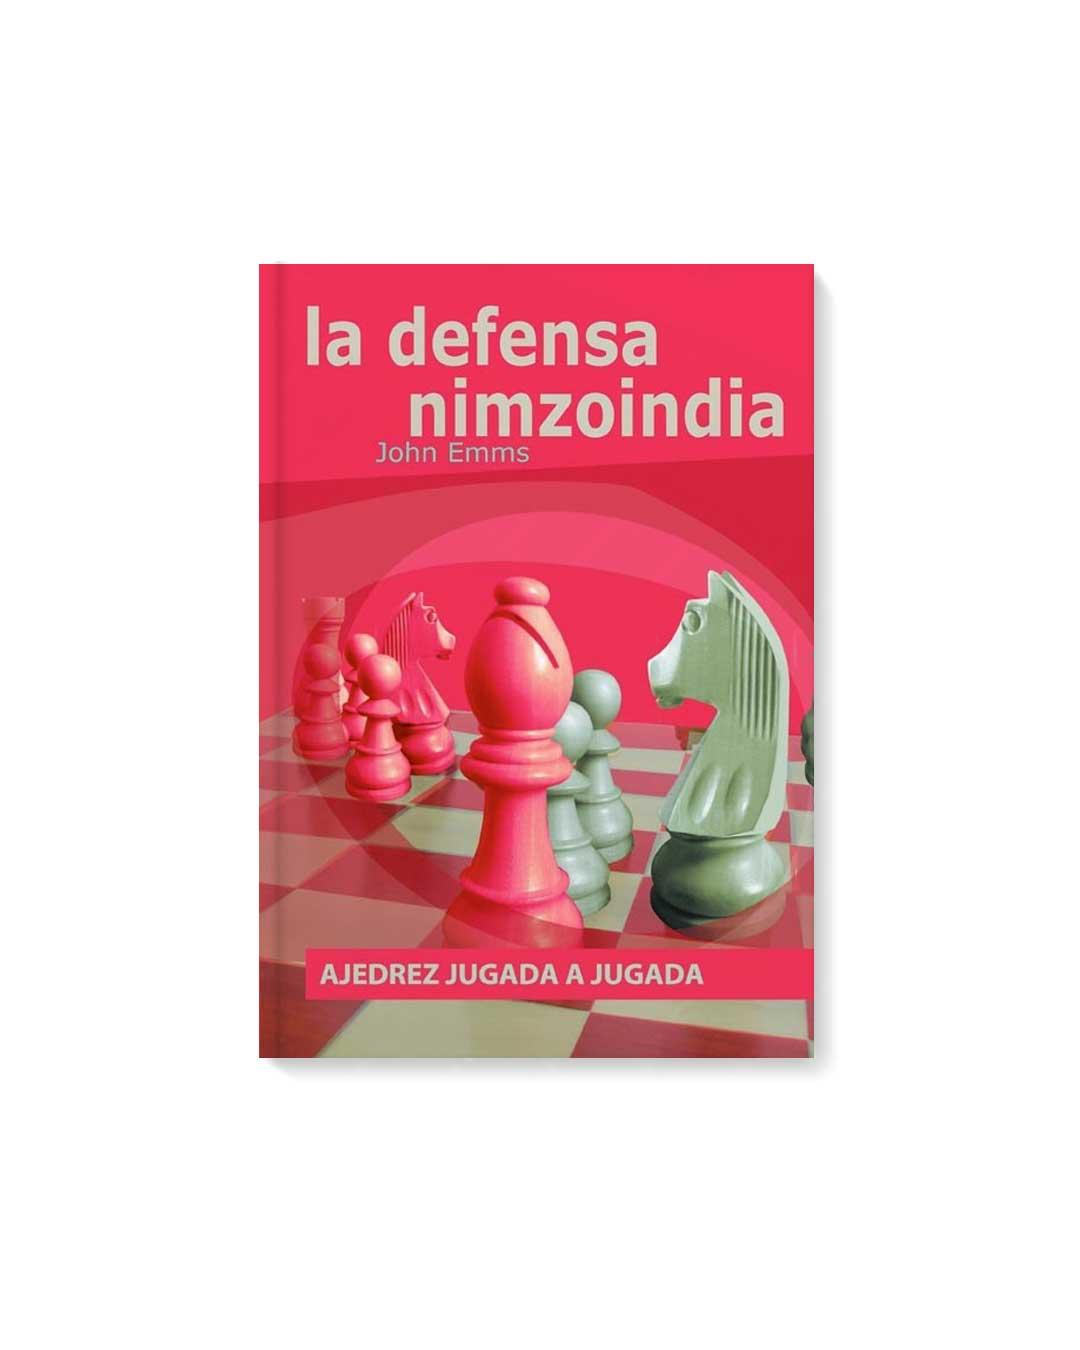 Defensa Nimzoindia - John Emms